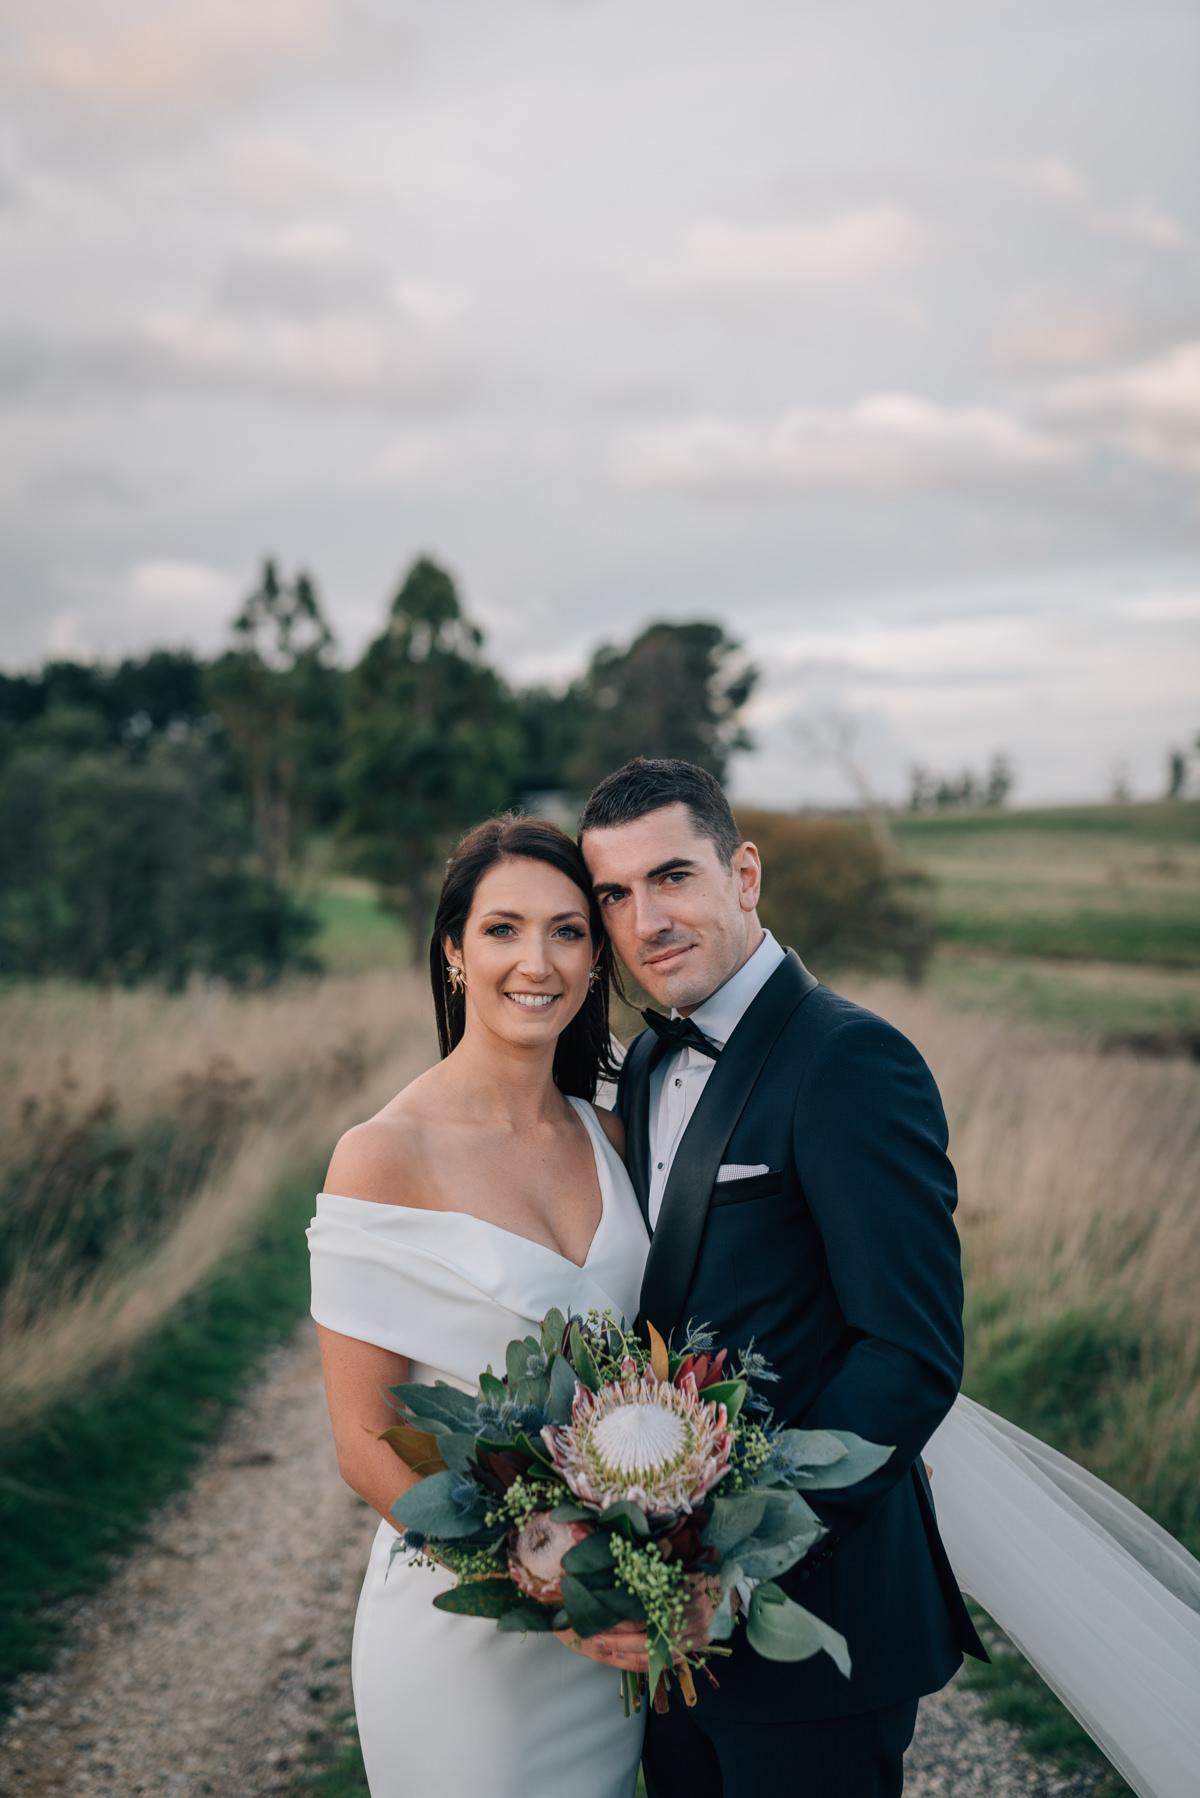 Wedding-Photohraphy-Launceston-Wines-For-Joanie-49.jpg